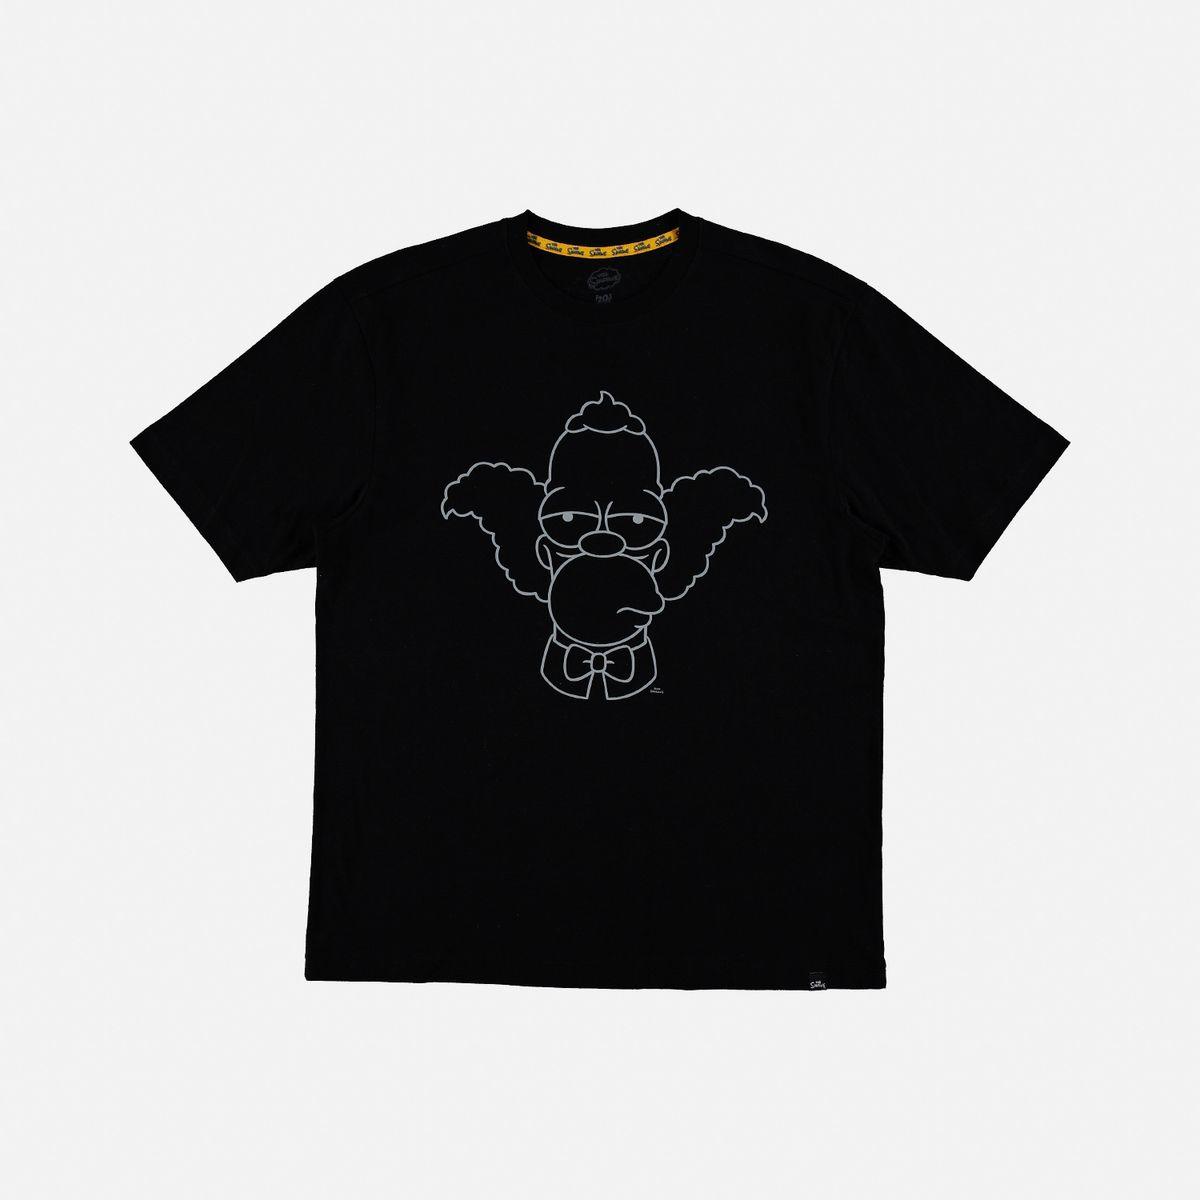 233306-camiseta--hombre-simpsons-manga-corta-1